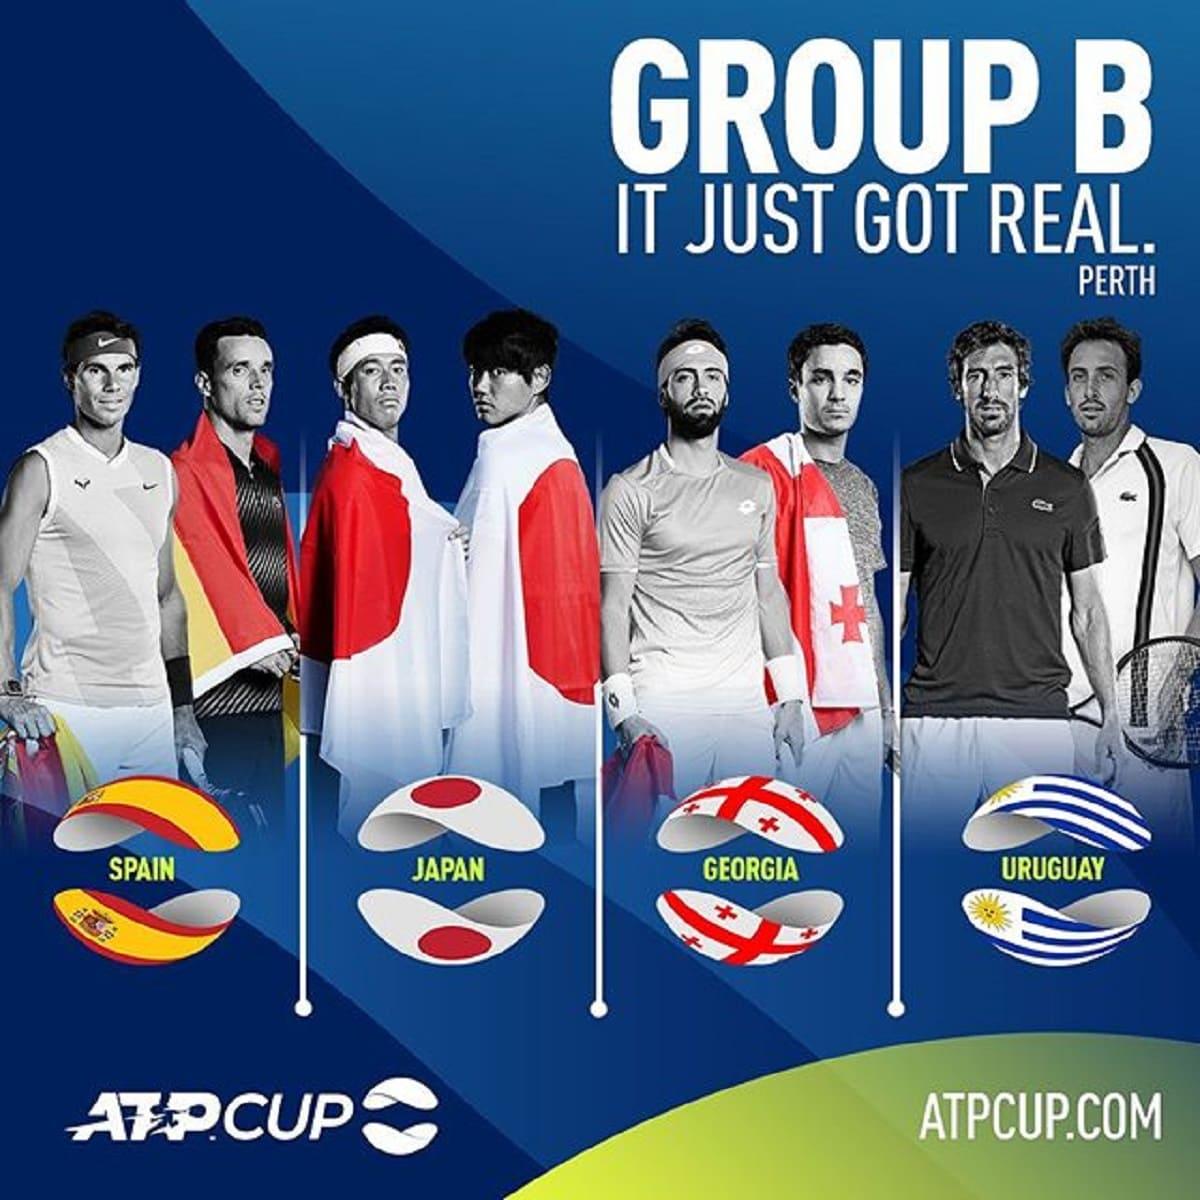 ATPカップ2020に出場の日本代表メンバーは?代表国・選手一覧・組み合わせ(トーナメン表)・順位表